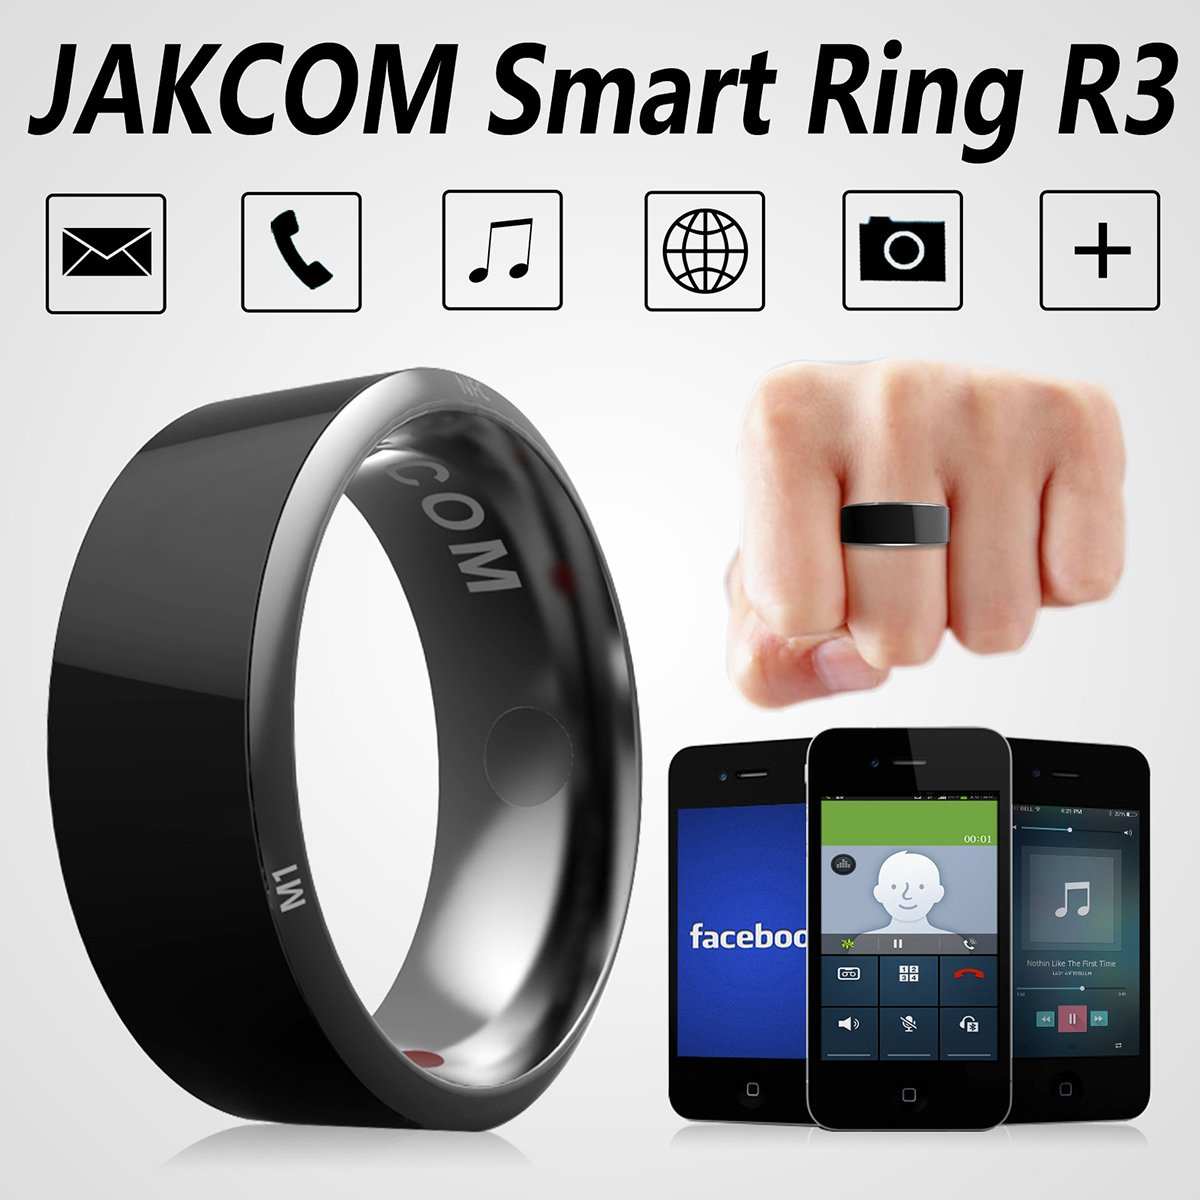 OLSUS Smart Ring Electronic Metal Mini Magic Ring - Black (Size 11)